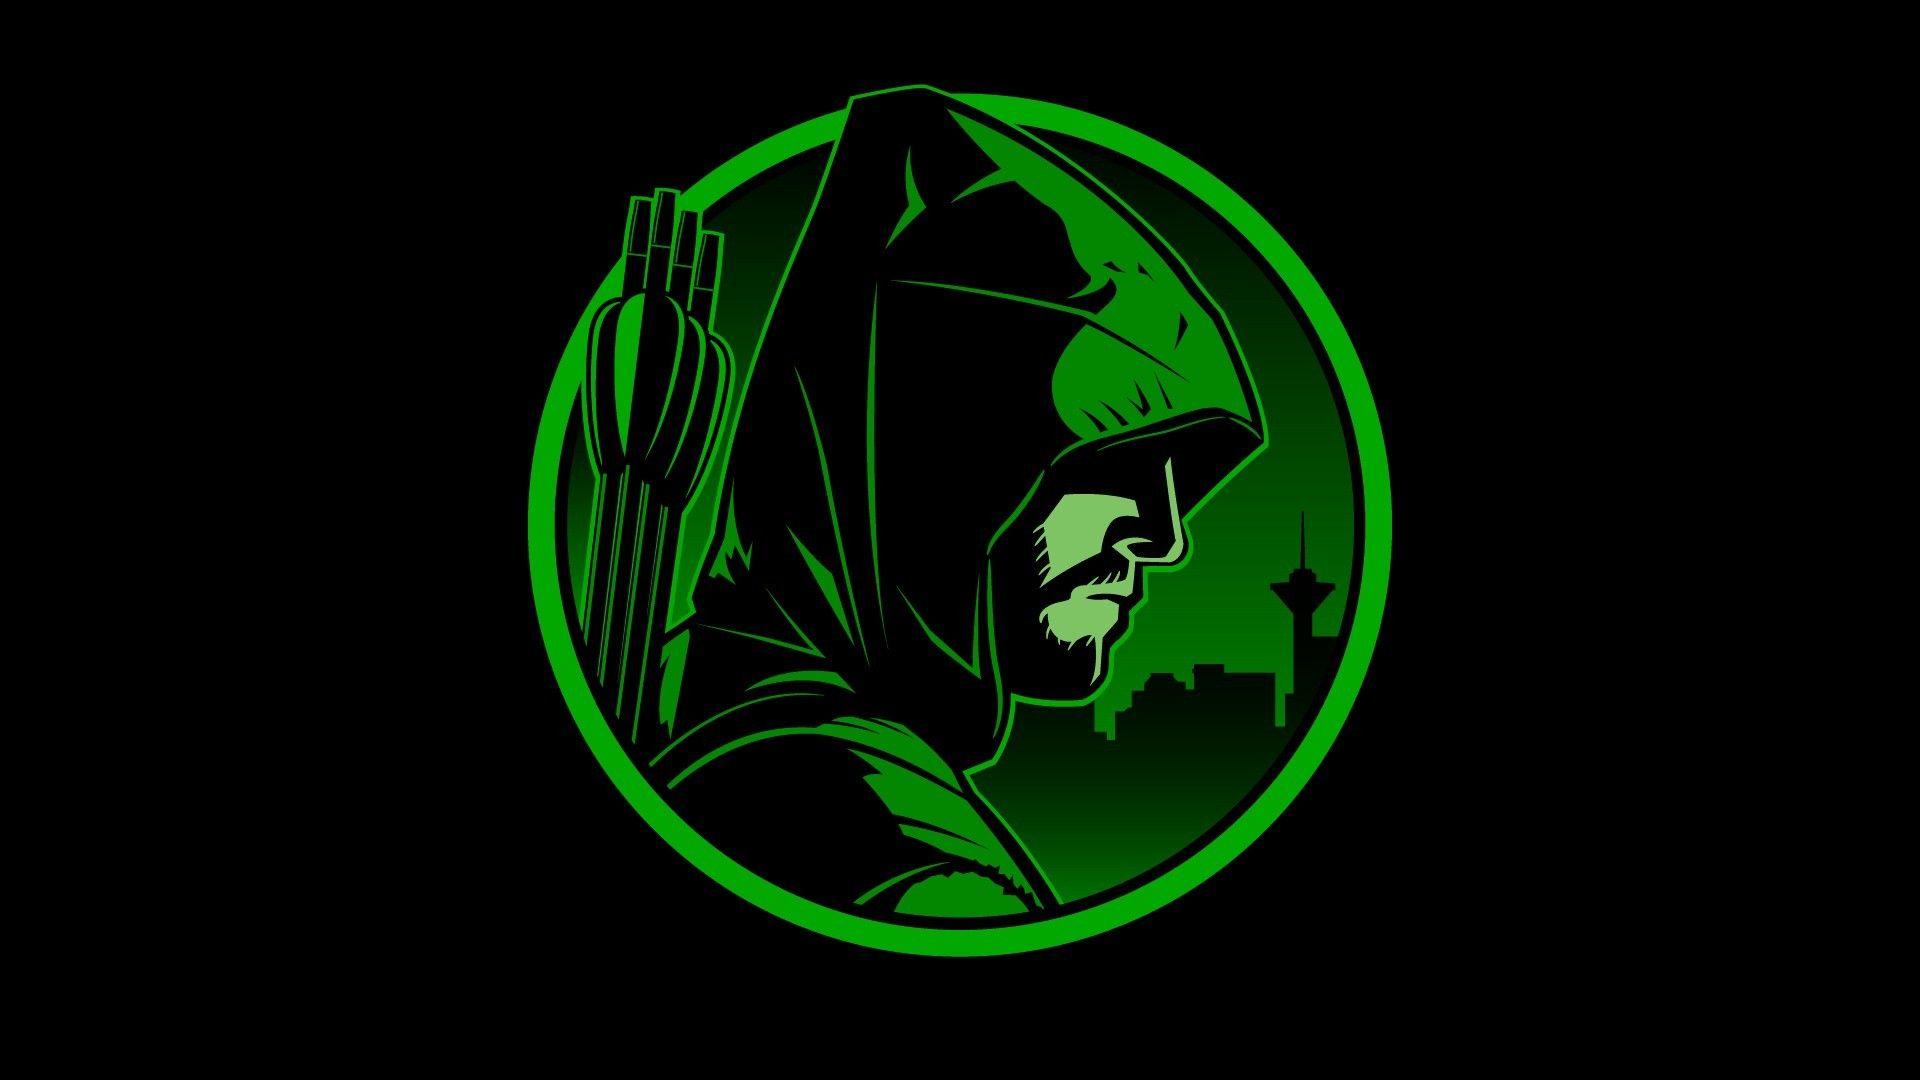 Green Arrow wallpaper   Arrow art, Arrow logo, Green arrow